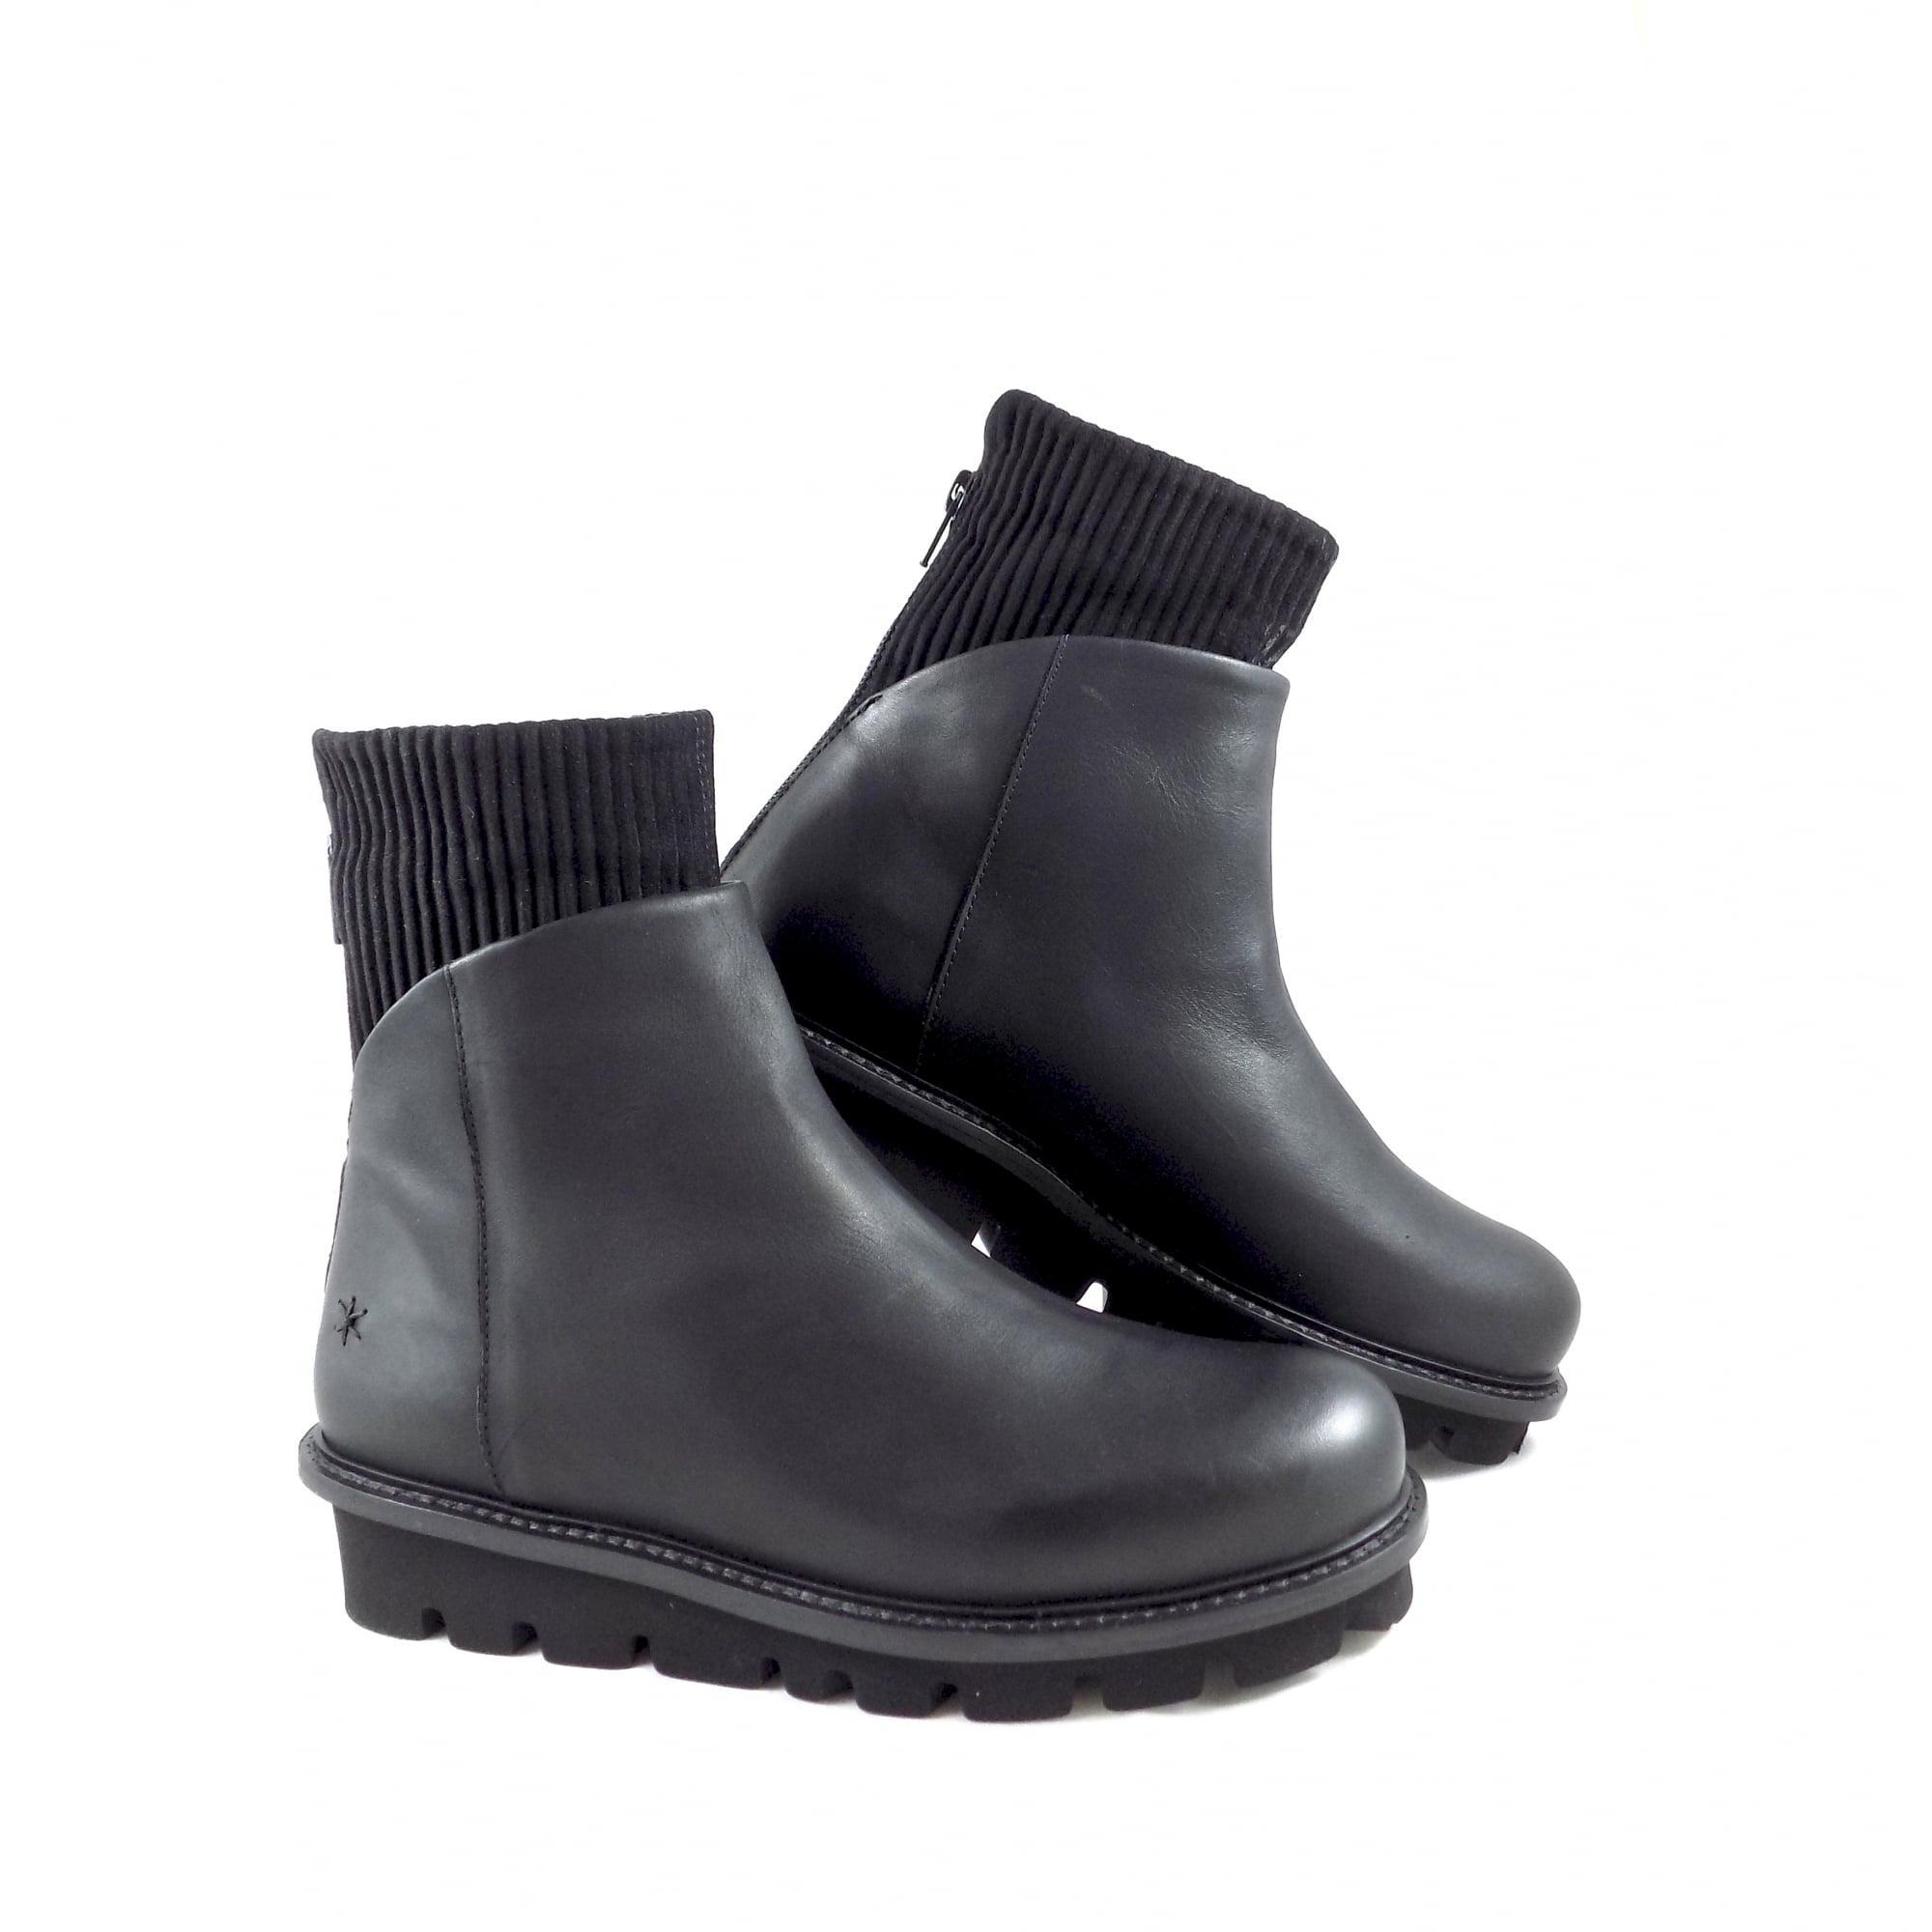 codice promozionale 19ff8 fd776 Patrizia Bonfanti Yaya Ankle Boots with Sock Detail   rubyshoesday